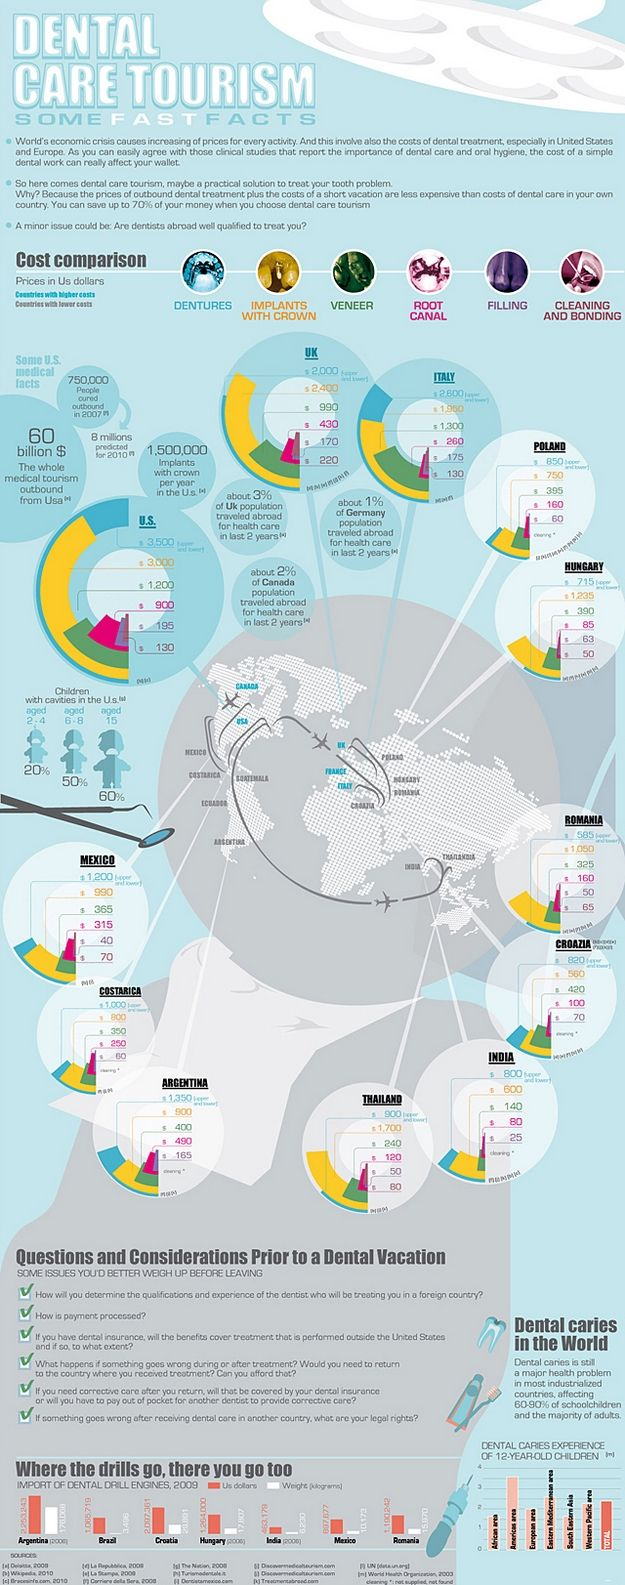 dentalcare-tourism-infographic